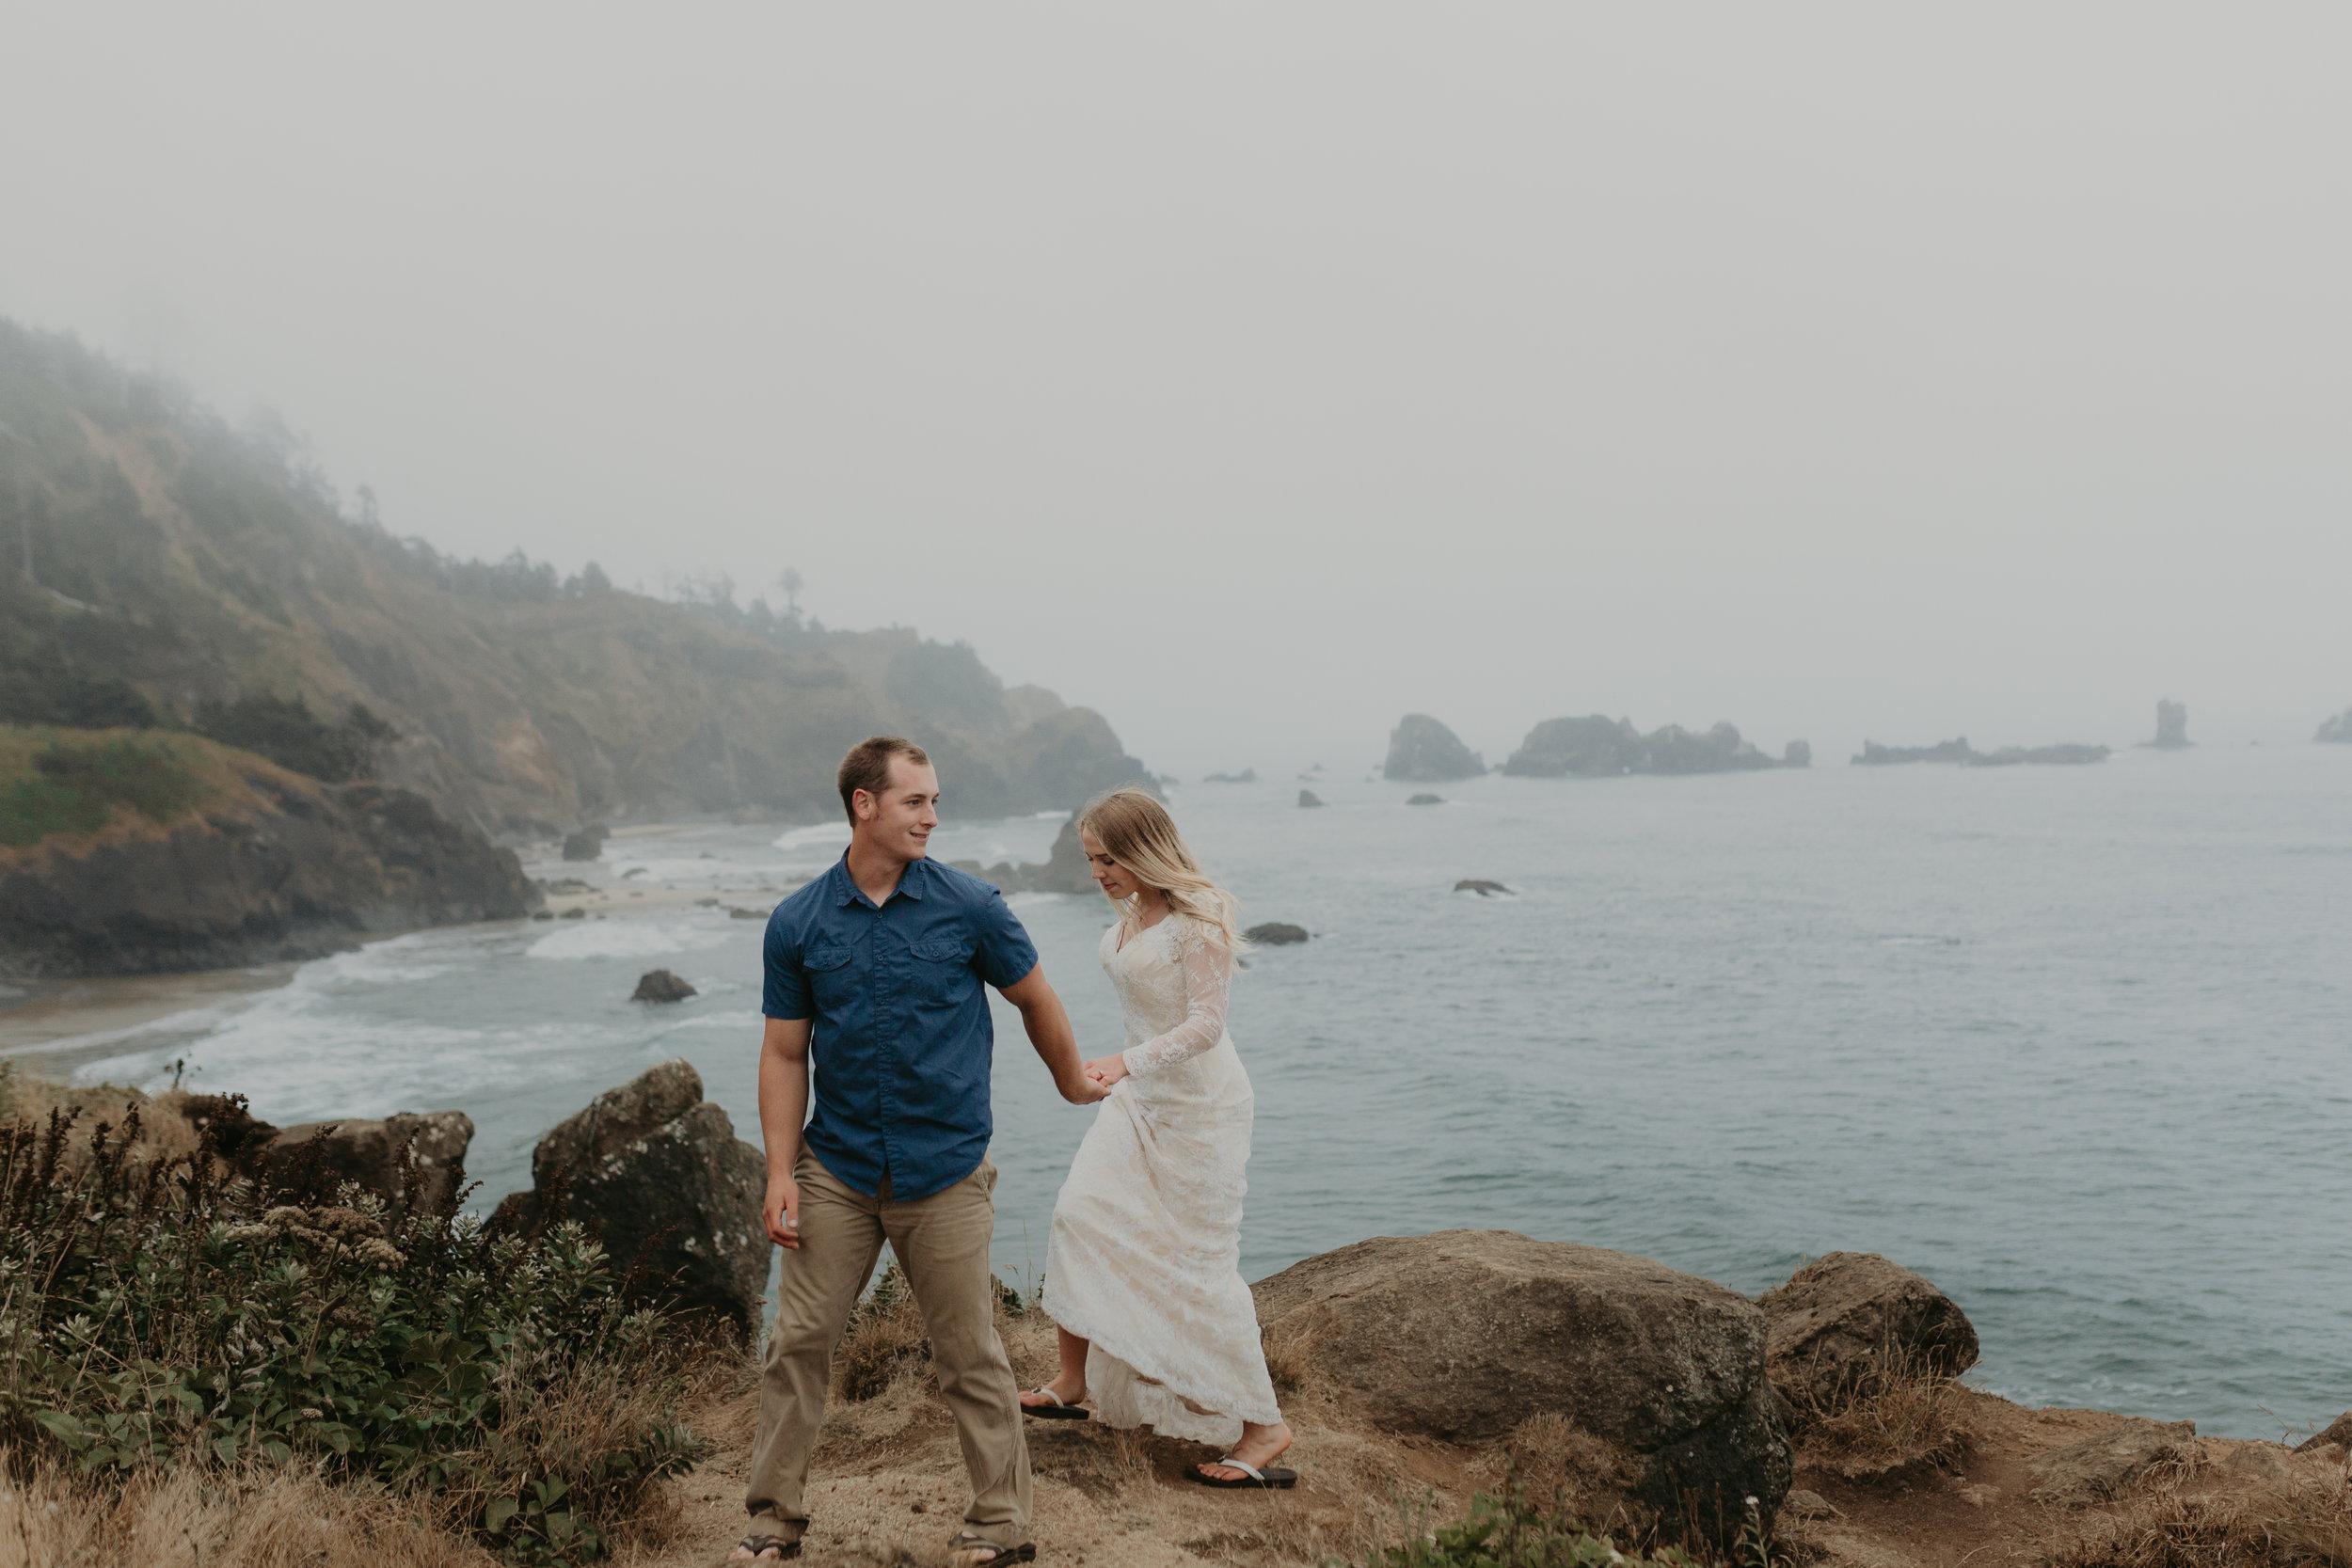 nicole-daacke-photography-ecola-state-park-oregon-elopement-bridal-photos-photographer-for-cannon-beach-elopement-oregon-coast-elopement-photographer-foggy-summer-elopement-cannon-beach-best-adventure-elopement-photographer-6992.jpg